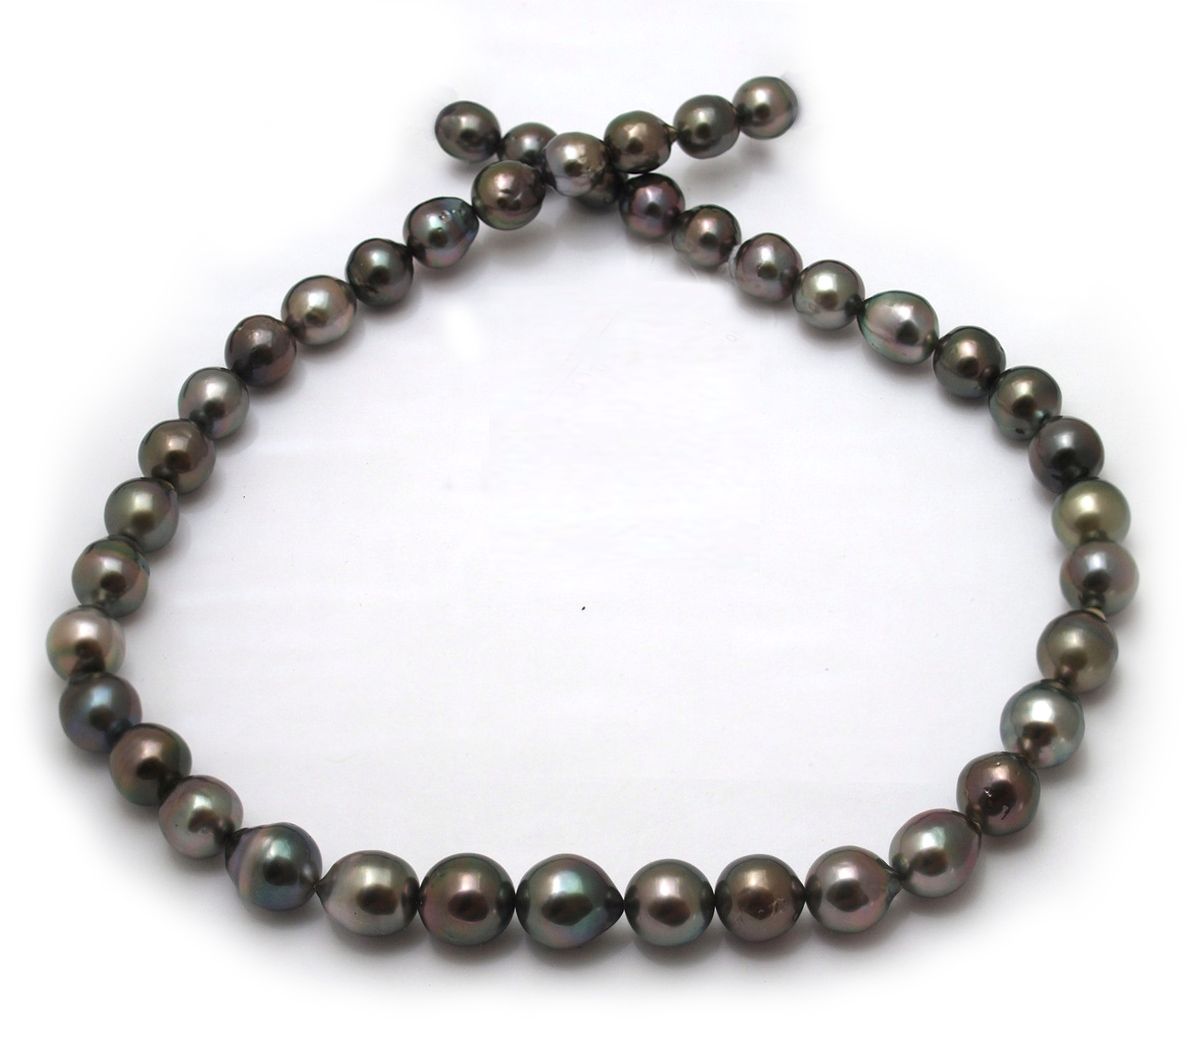 Discount Jewelry Catalog